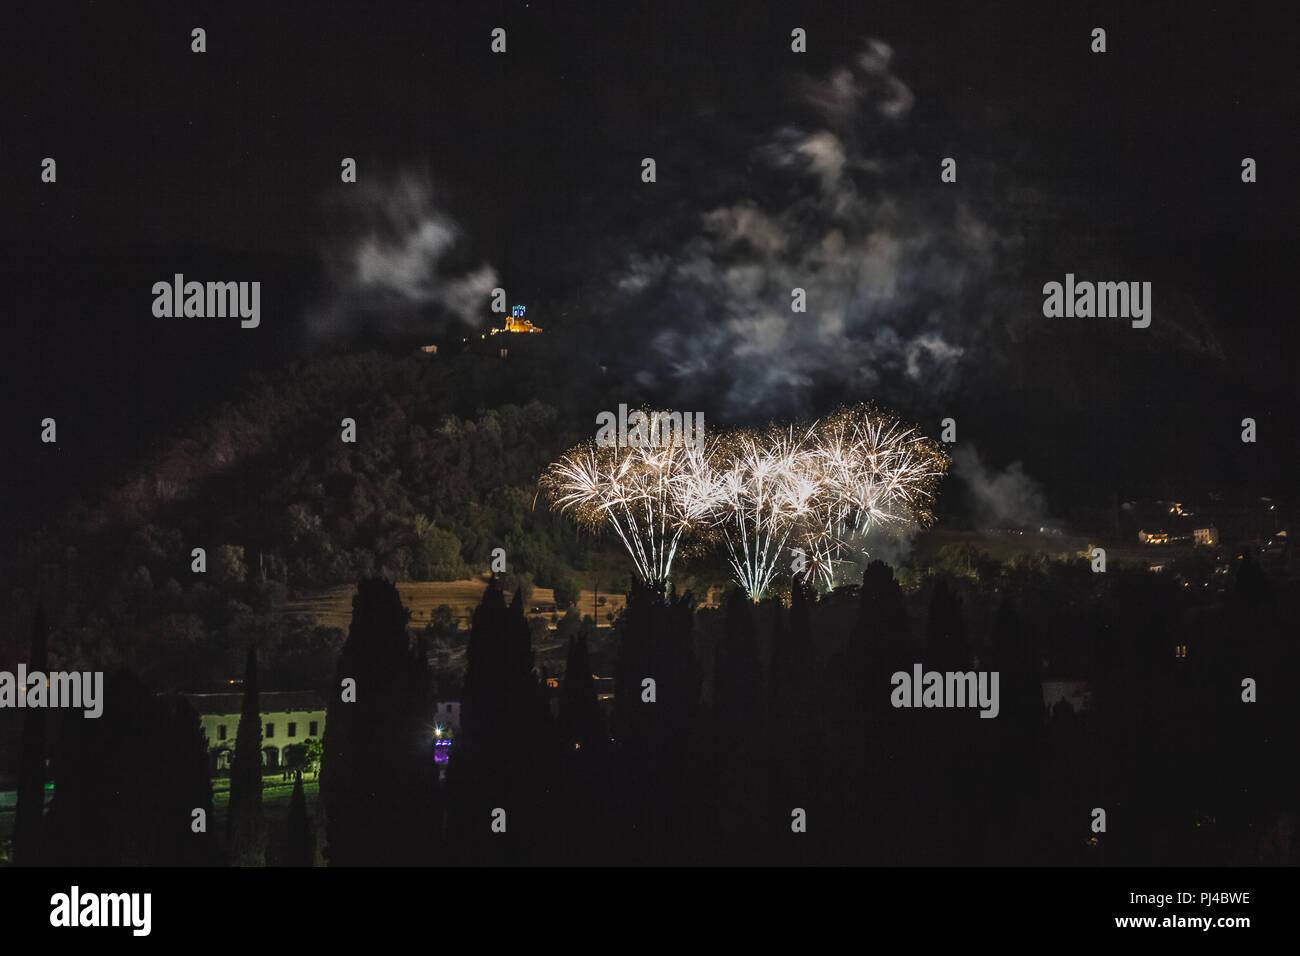 fireworks with illuminated church of the patron saint of the city background vittorio veneto italy